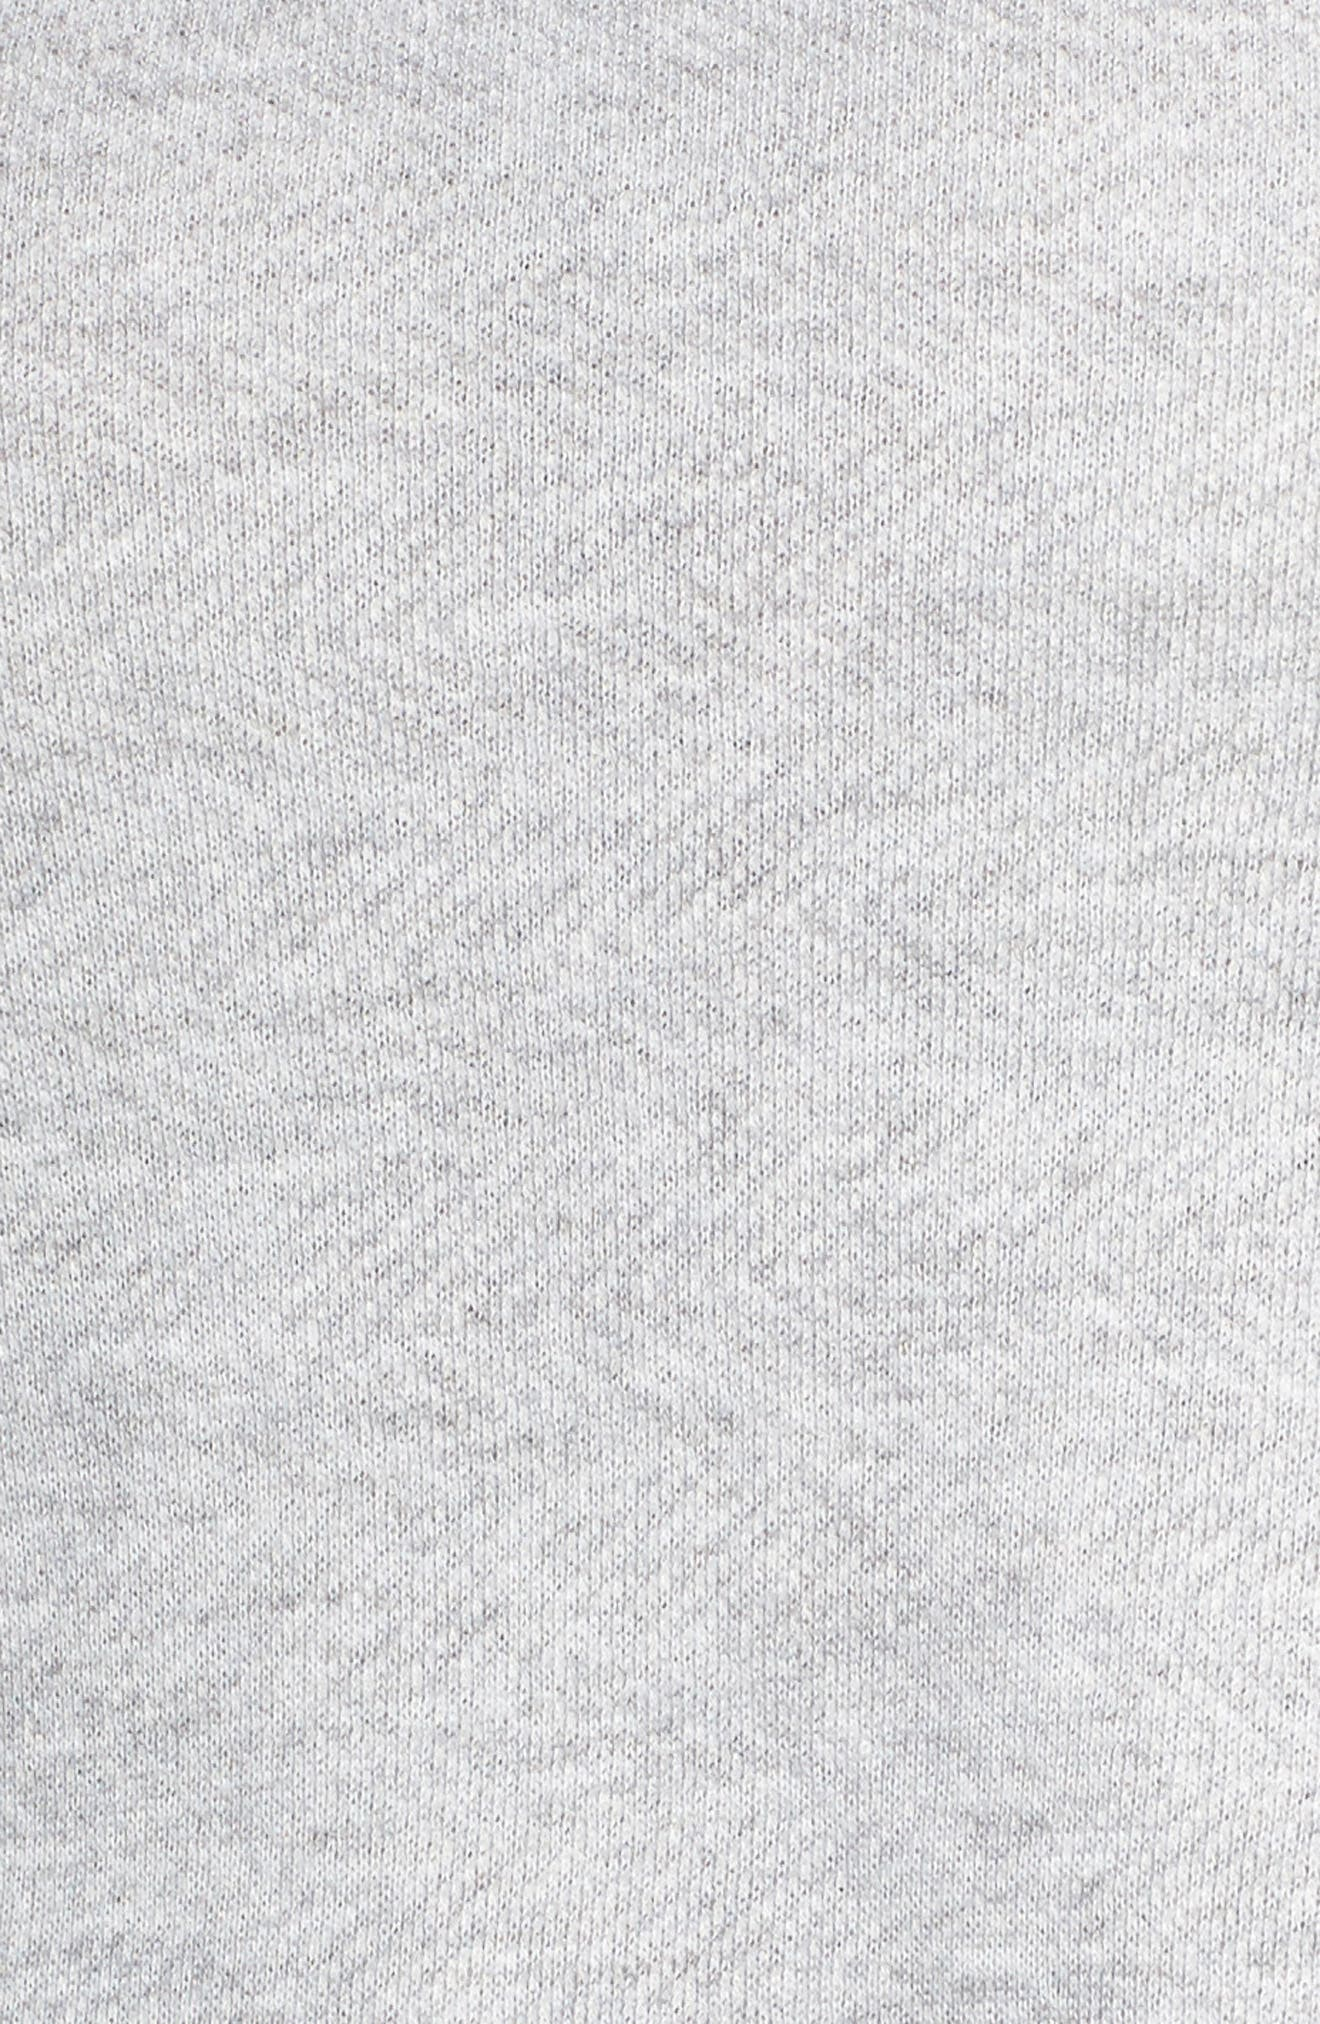 Layered Look Sweatshirt,                             Alternate thumbnail 5, color,                             030